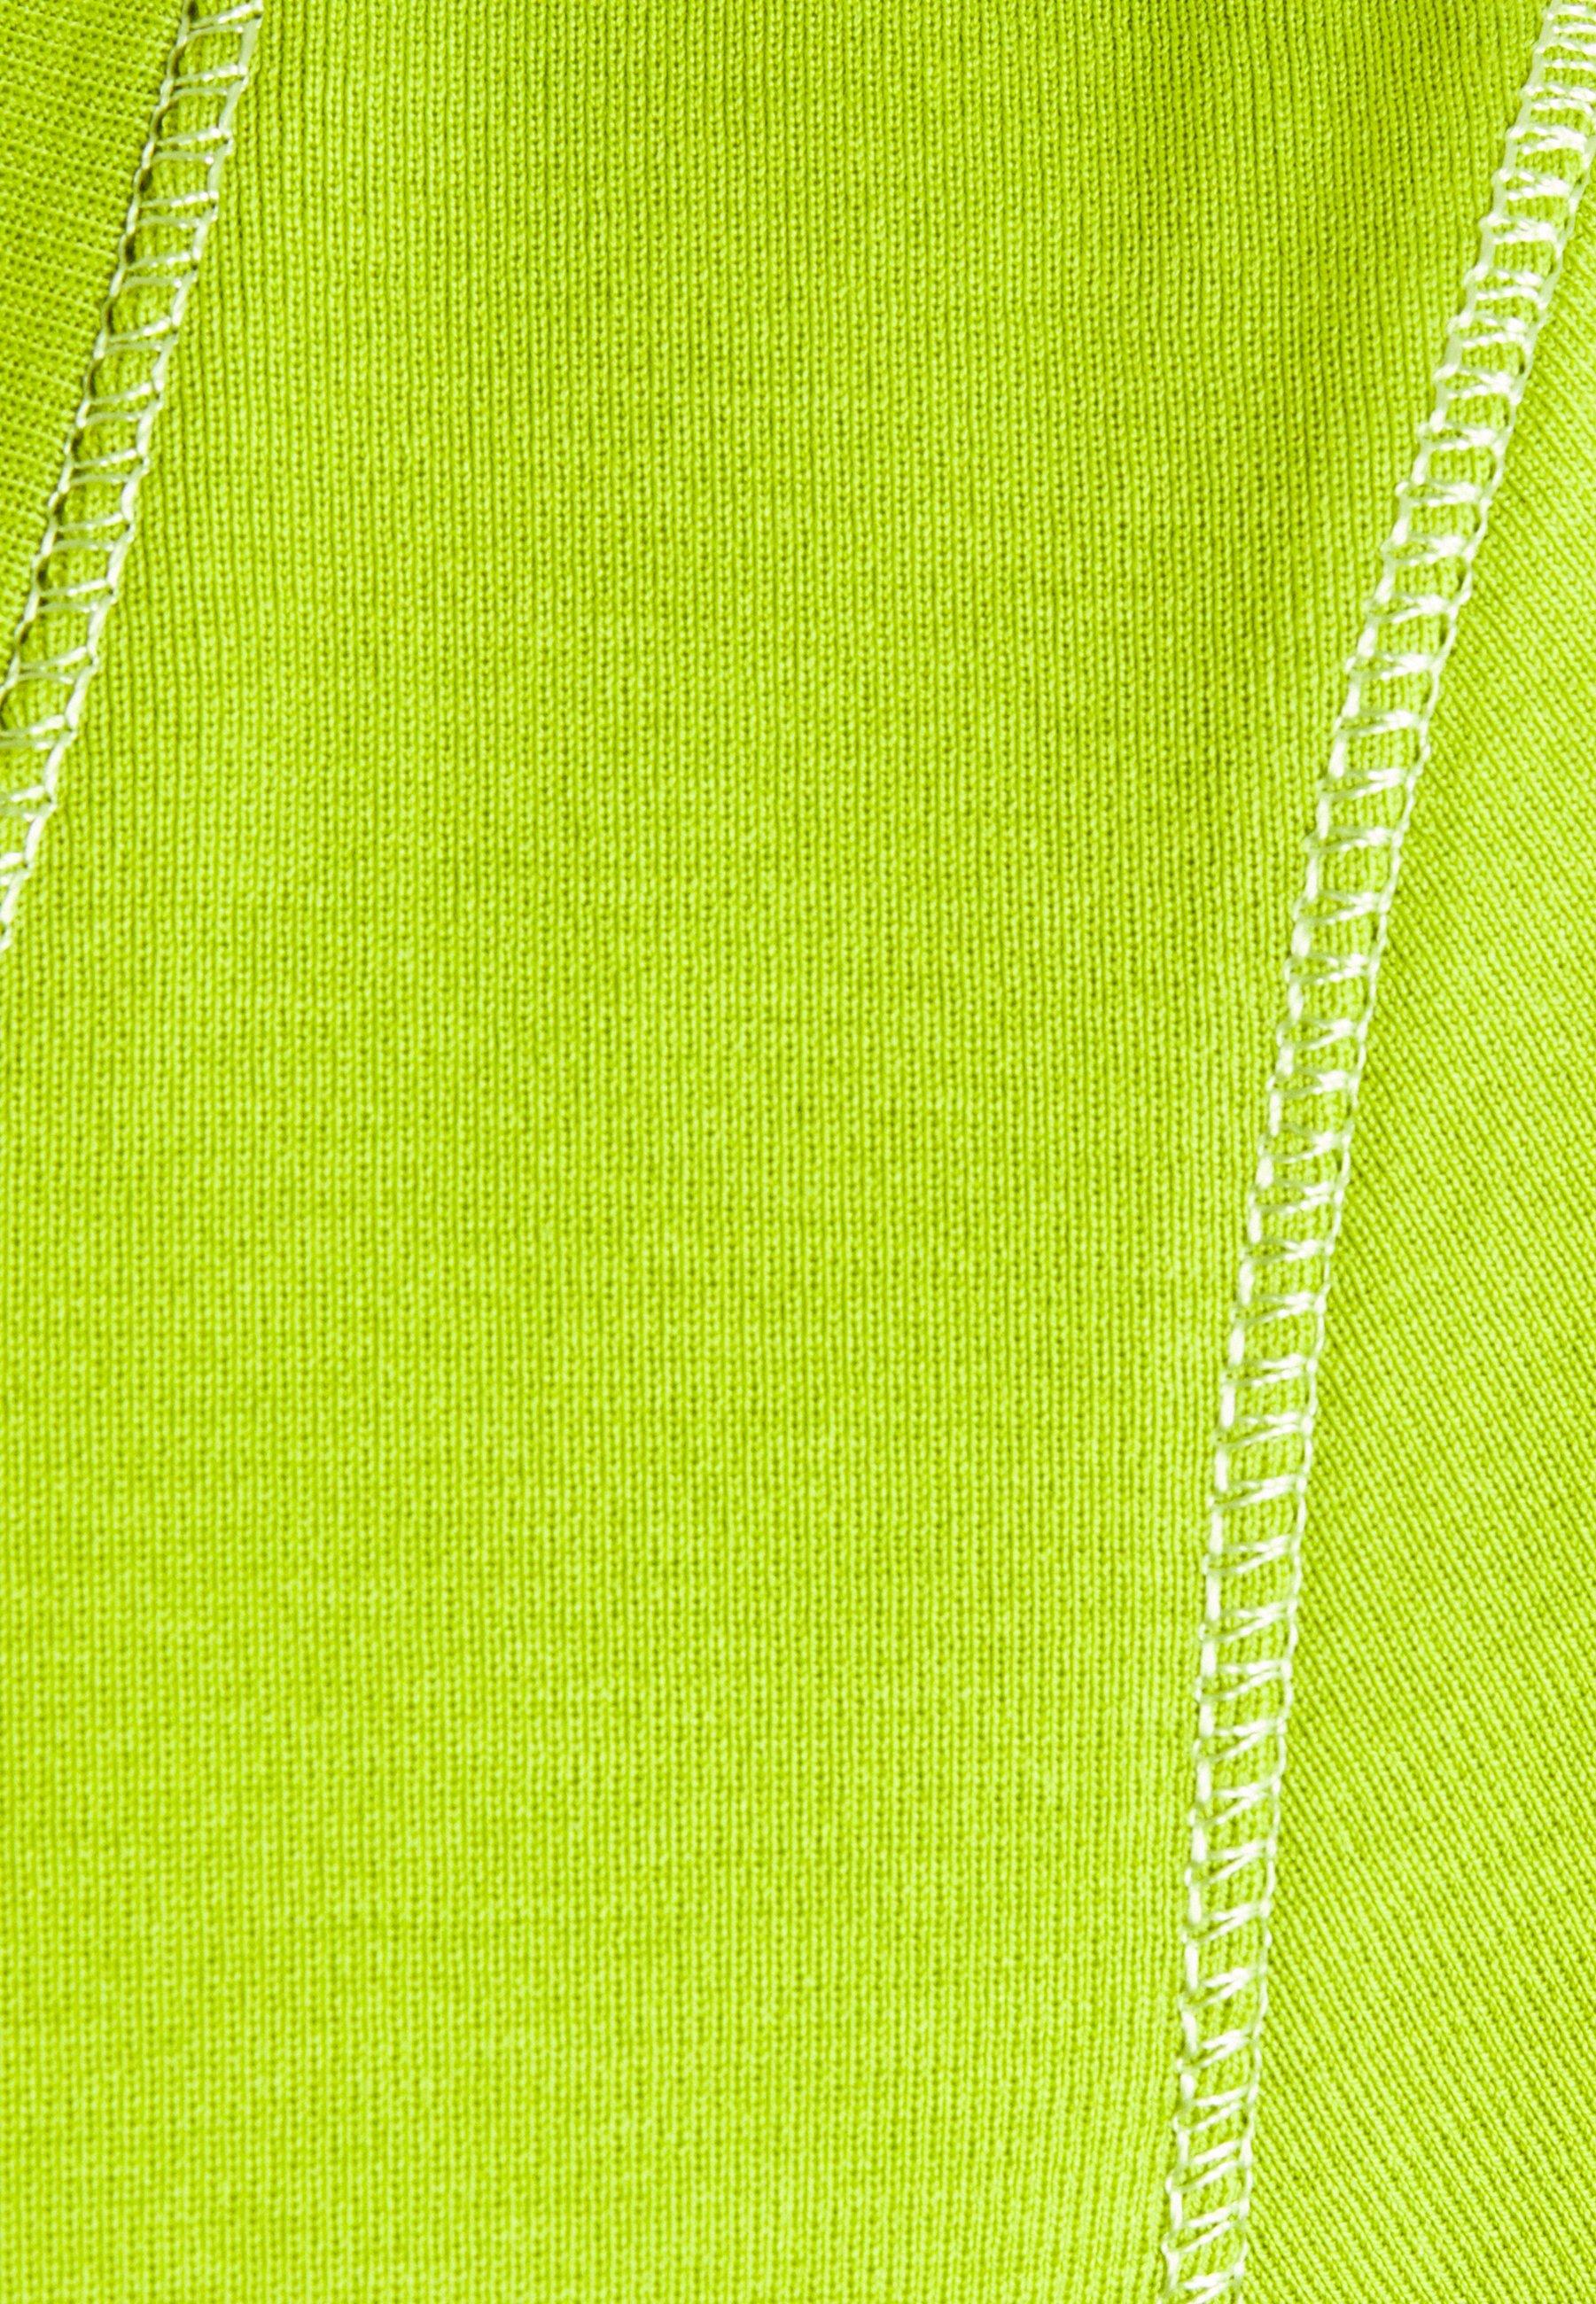 Marc Cain T-shirts - Pea/grønn